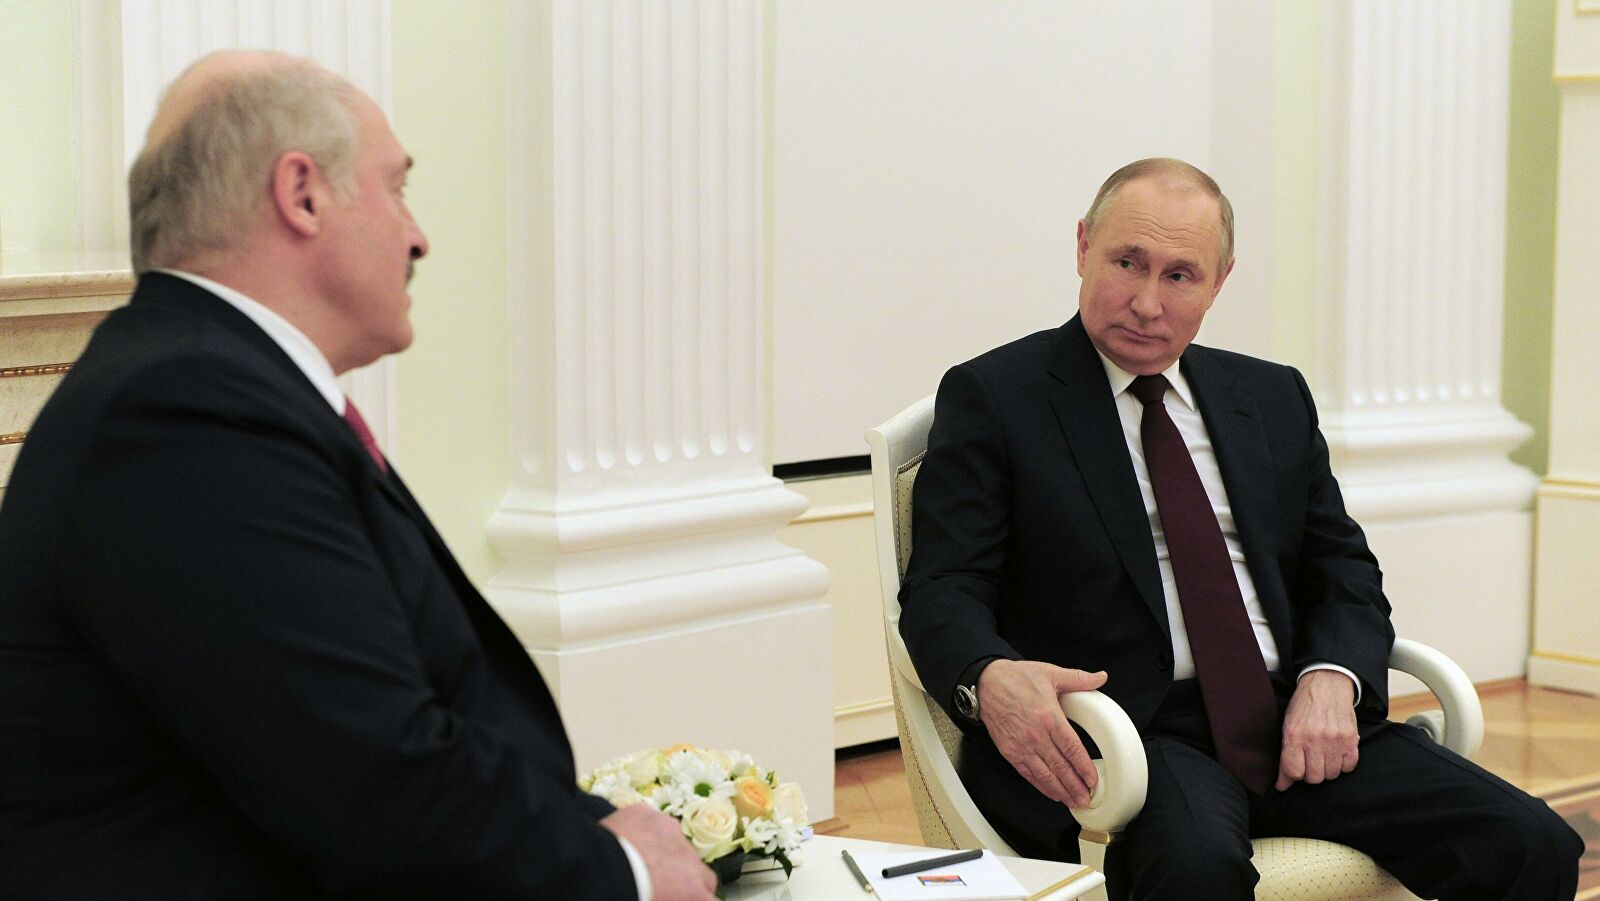 Kremlin names topics of meeting between Putin and Lukashenko